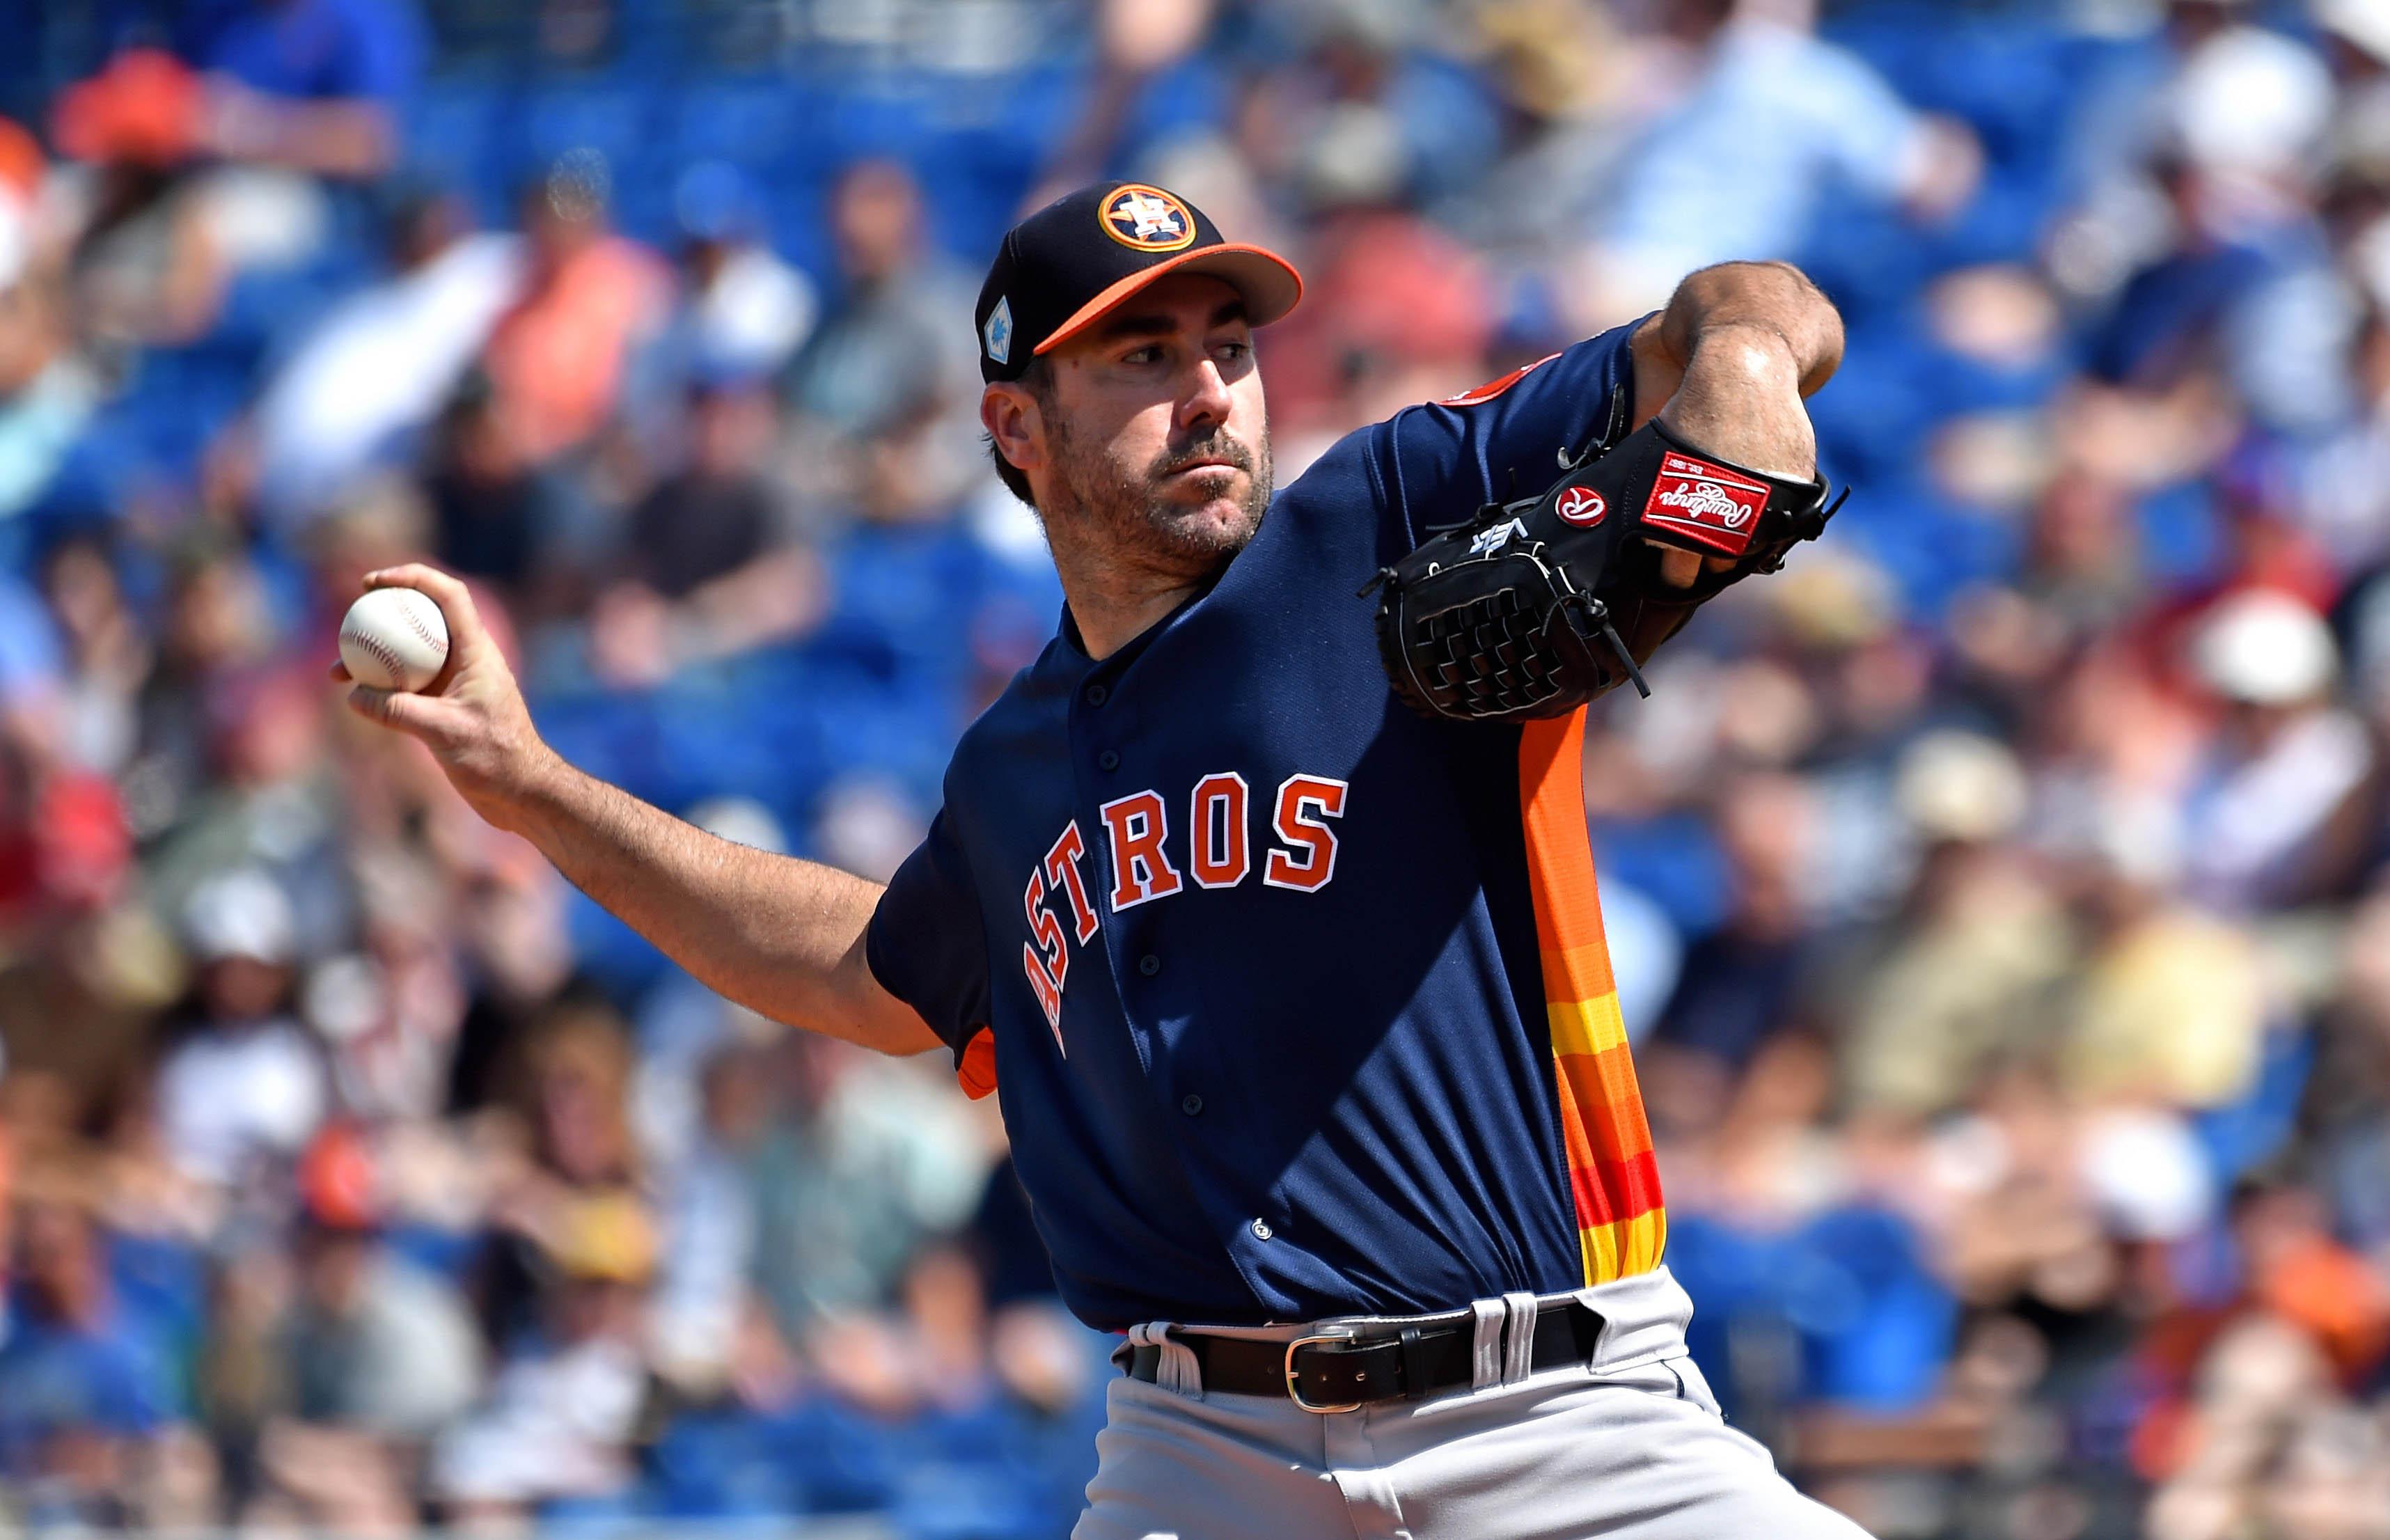 MLB: Spring Training-Houston Astros at New York Mets